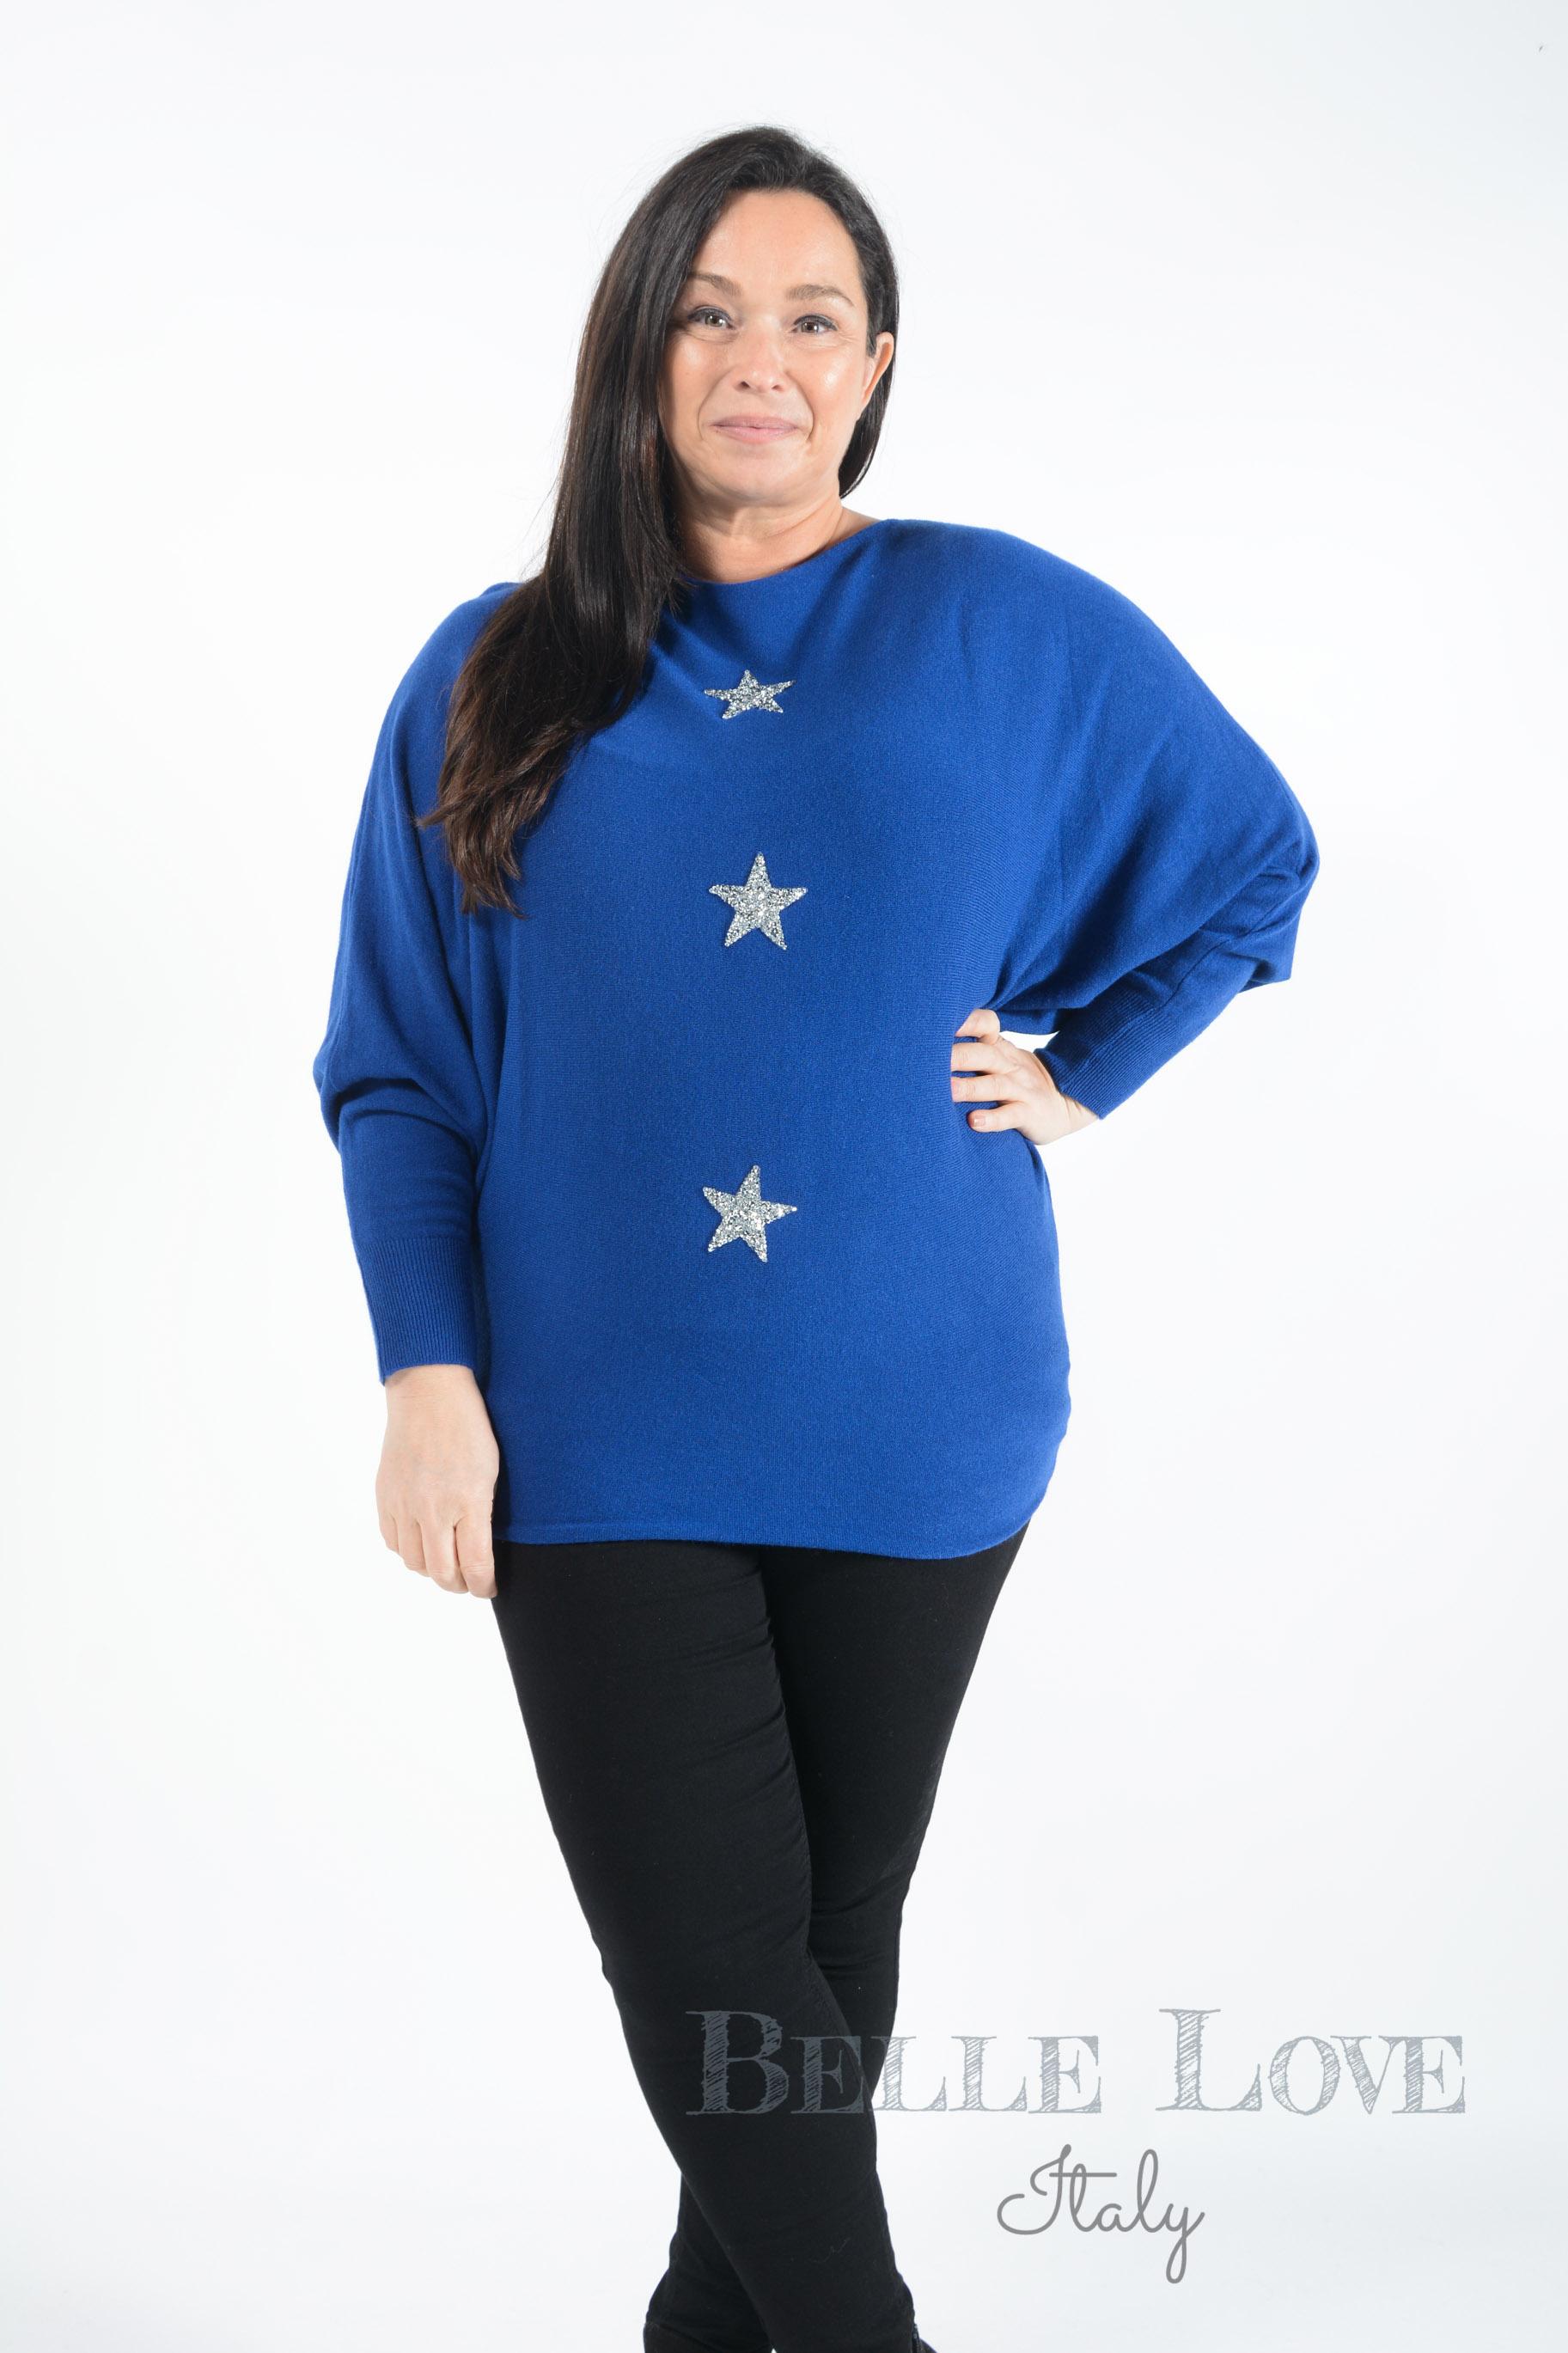 Belle Love Italy Nicola Star Knitwear